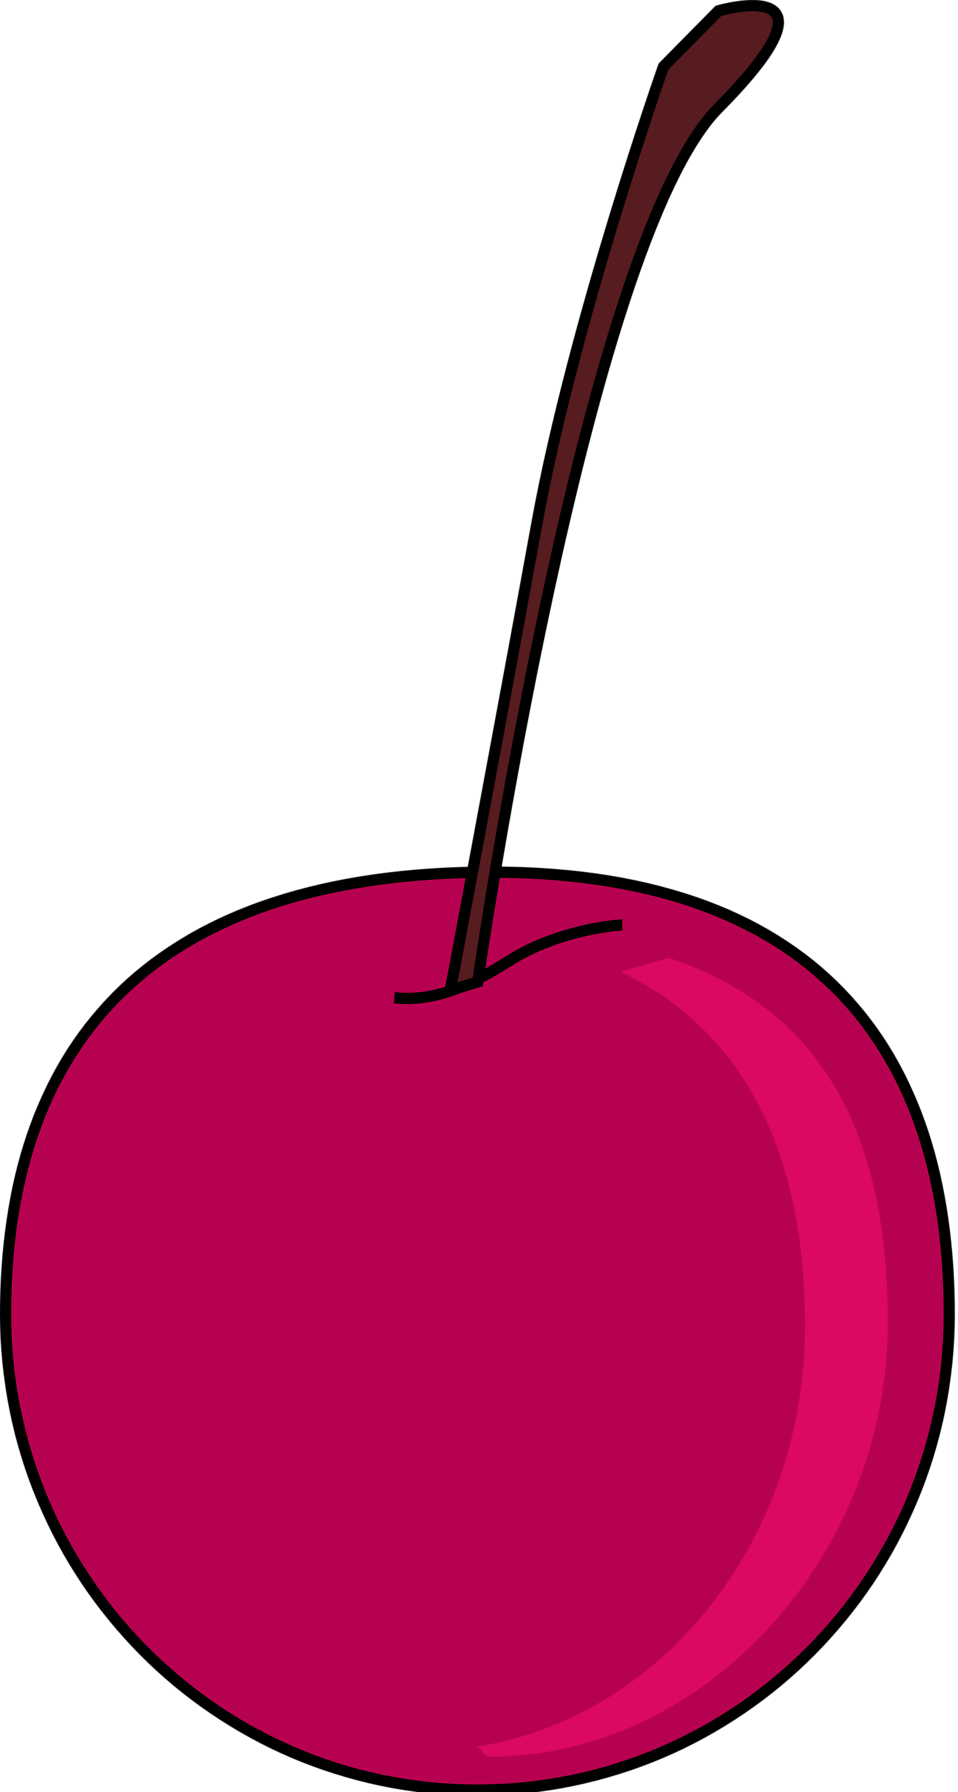 Free stock photo illustration. Cherry clipart bunch cherry